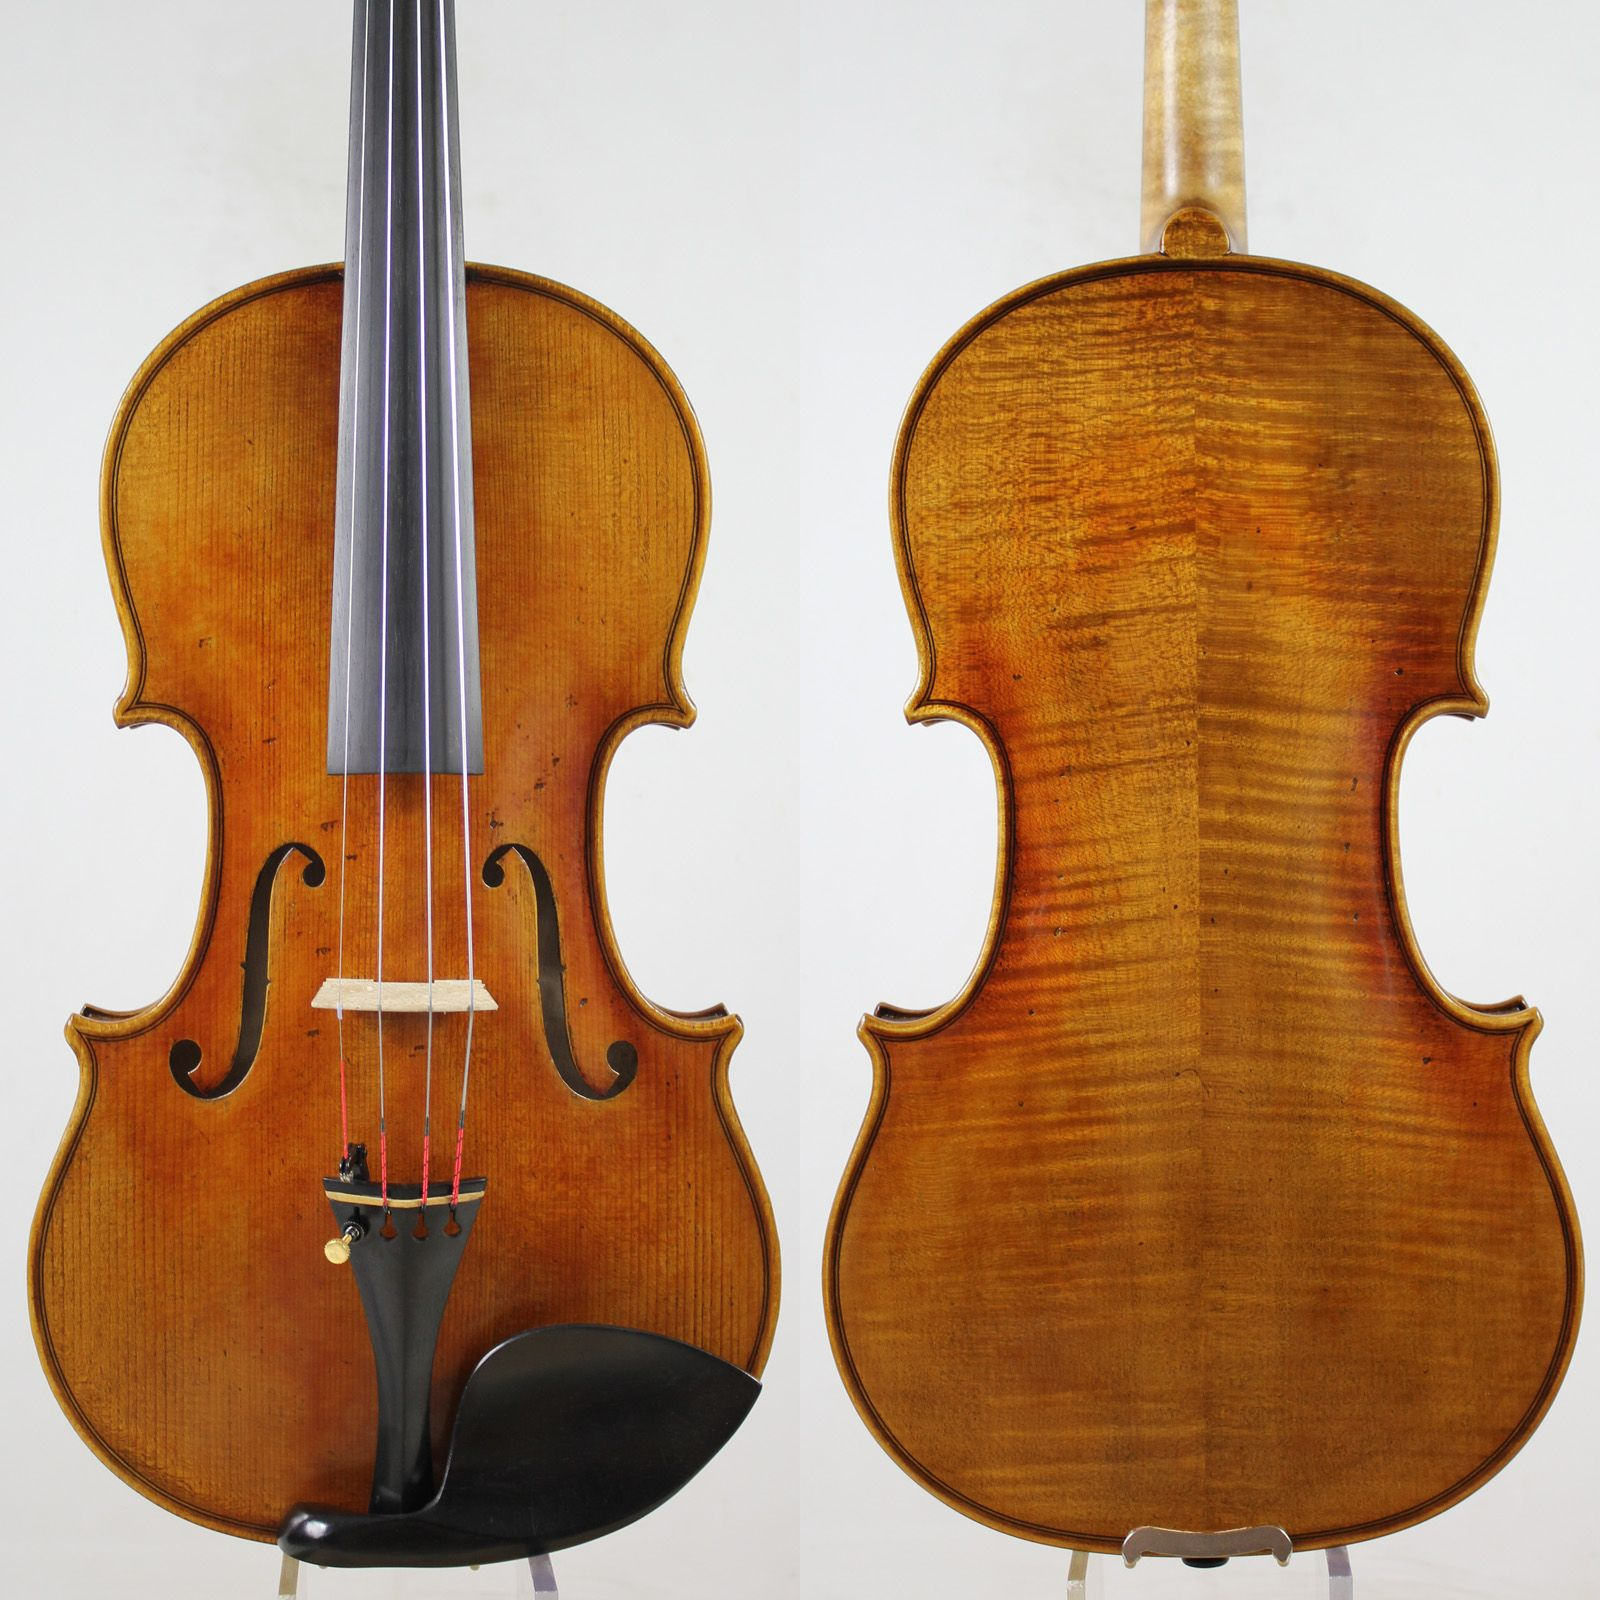 Linkshänder Stradivarius Kruse 1721 Violine violino